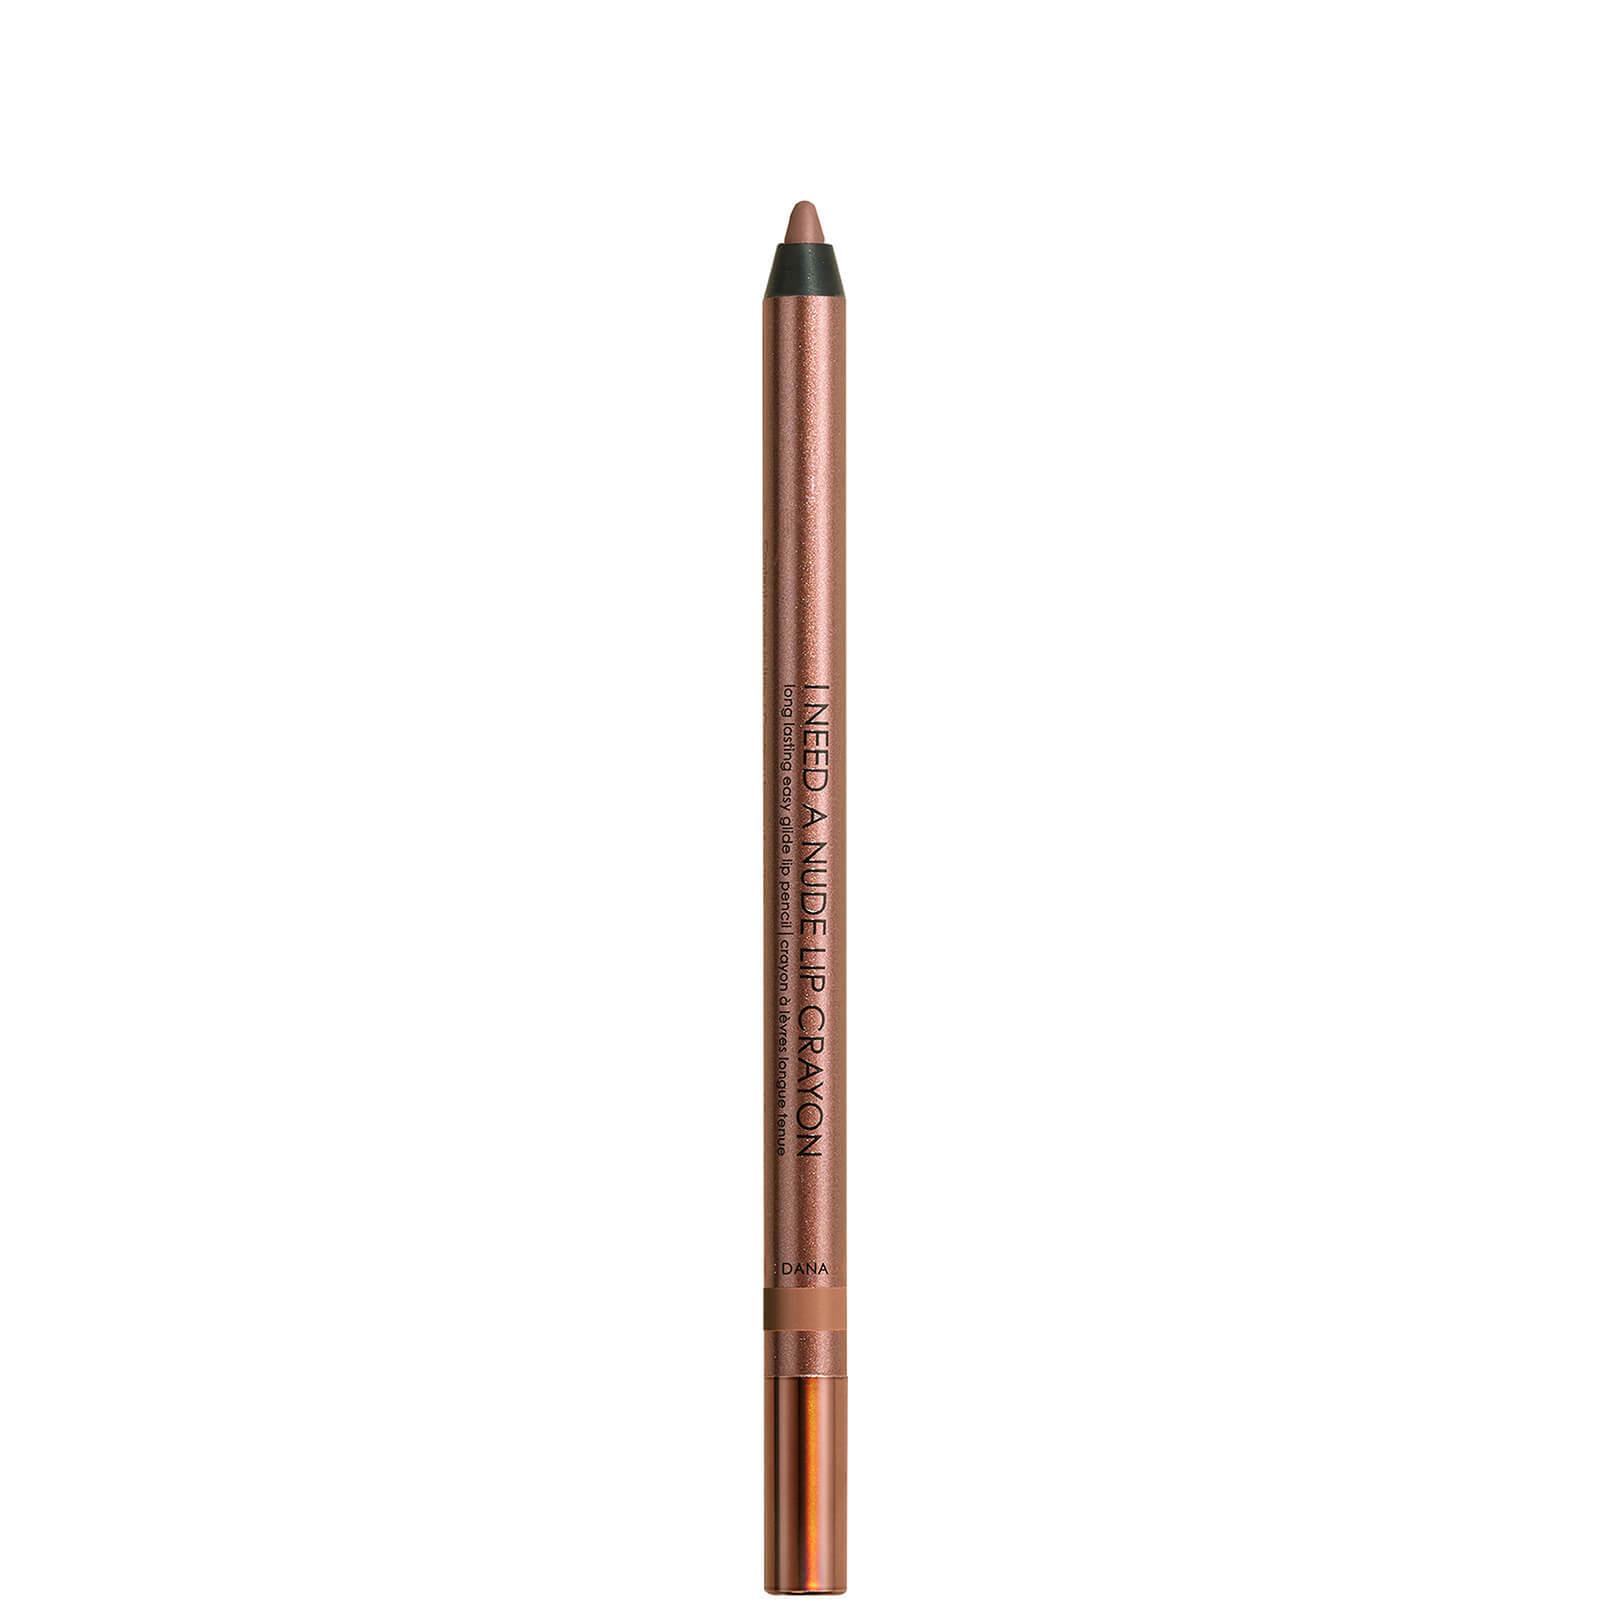 Купить Natasha Denona I Need a Nude Lip Crayon (Various Shades) - NB3 Dana